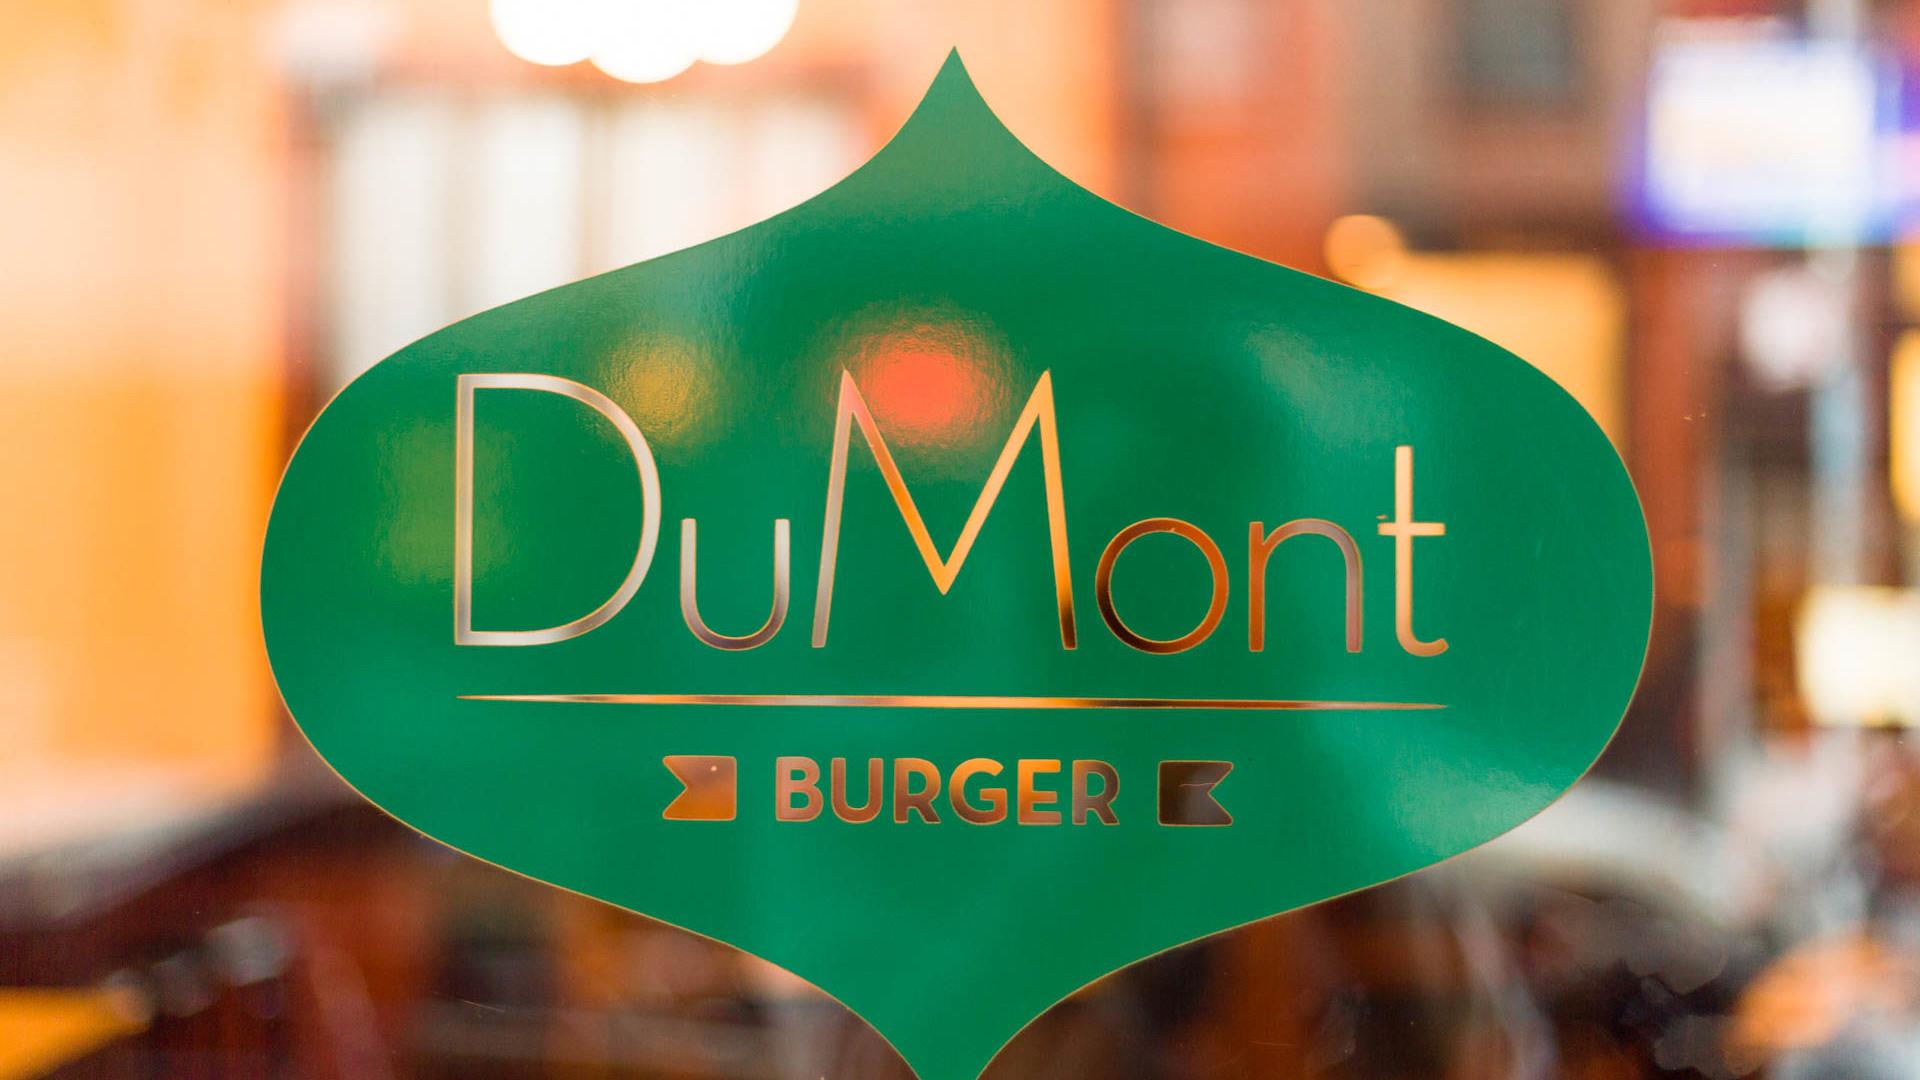 Dumont burger 9